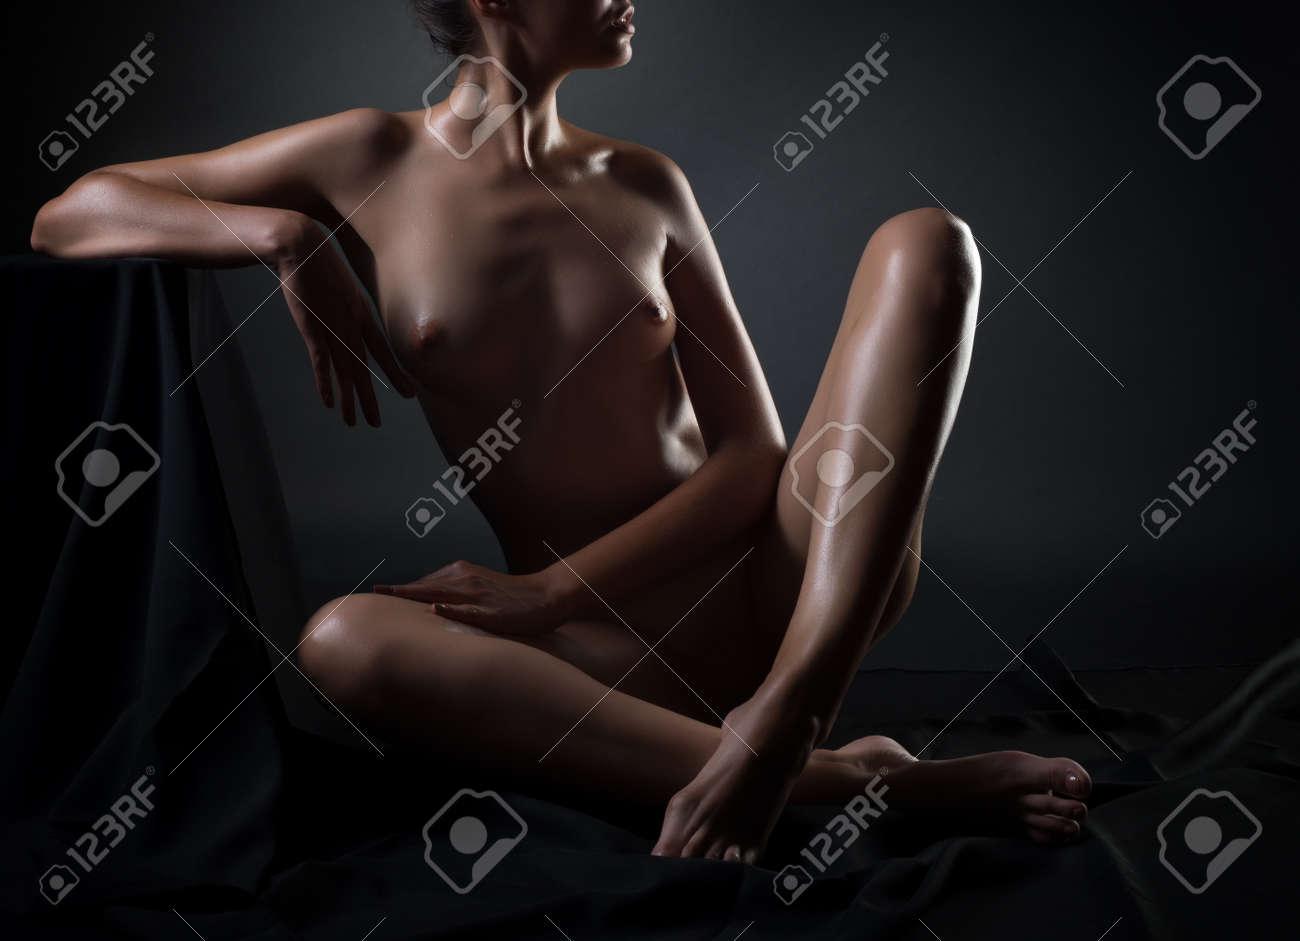 Nackt art sexy Nude ballet